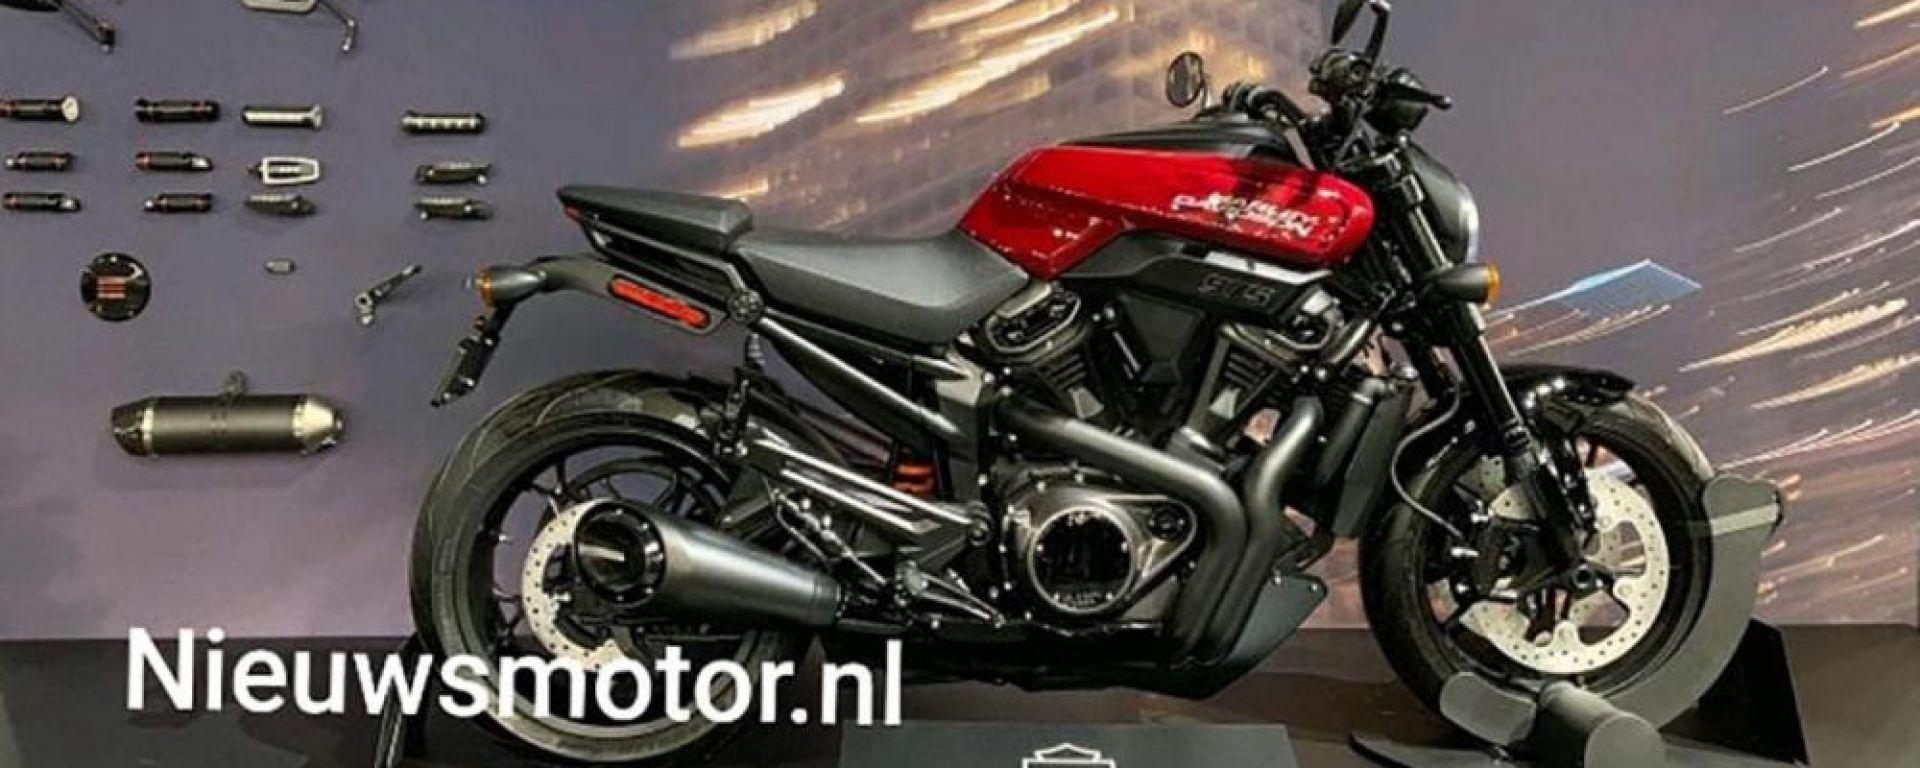 Streetfighter e Pan America 2020: le prime foto delle nuove Harley-Davidson